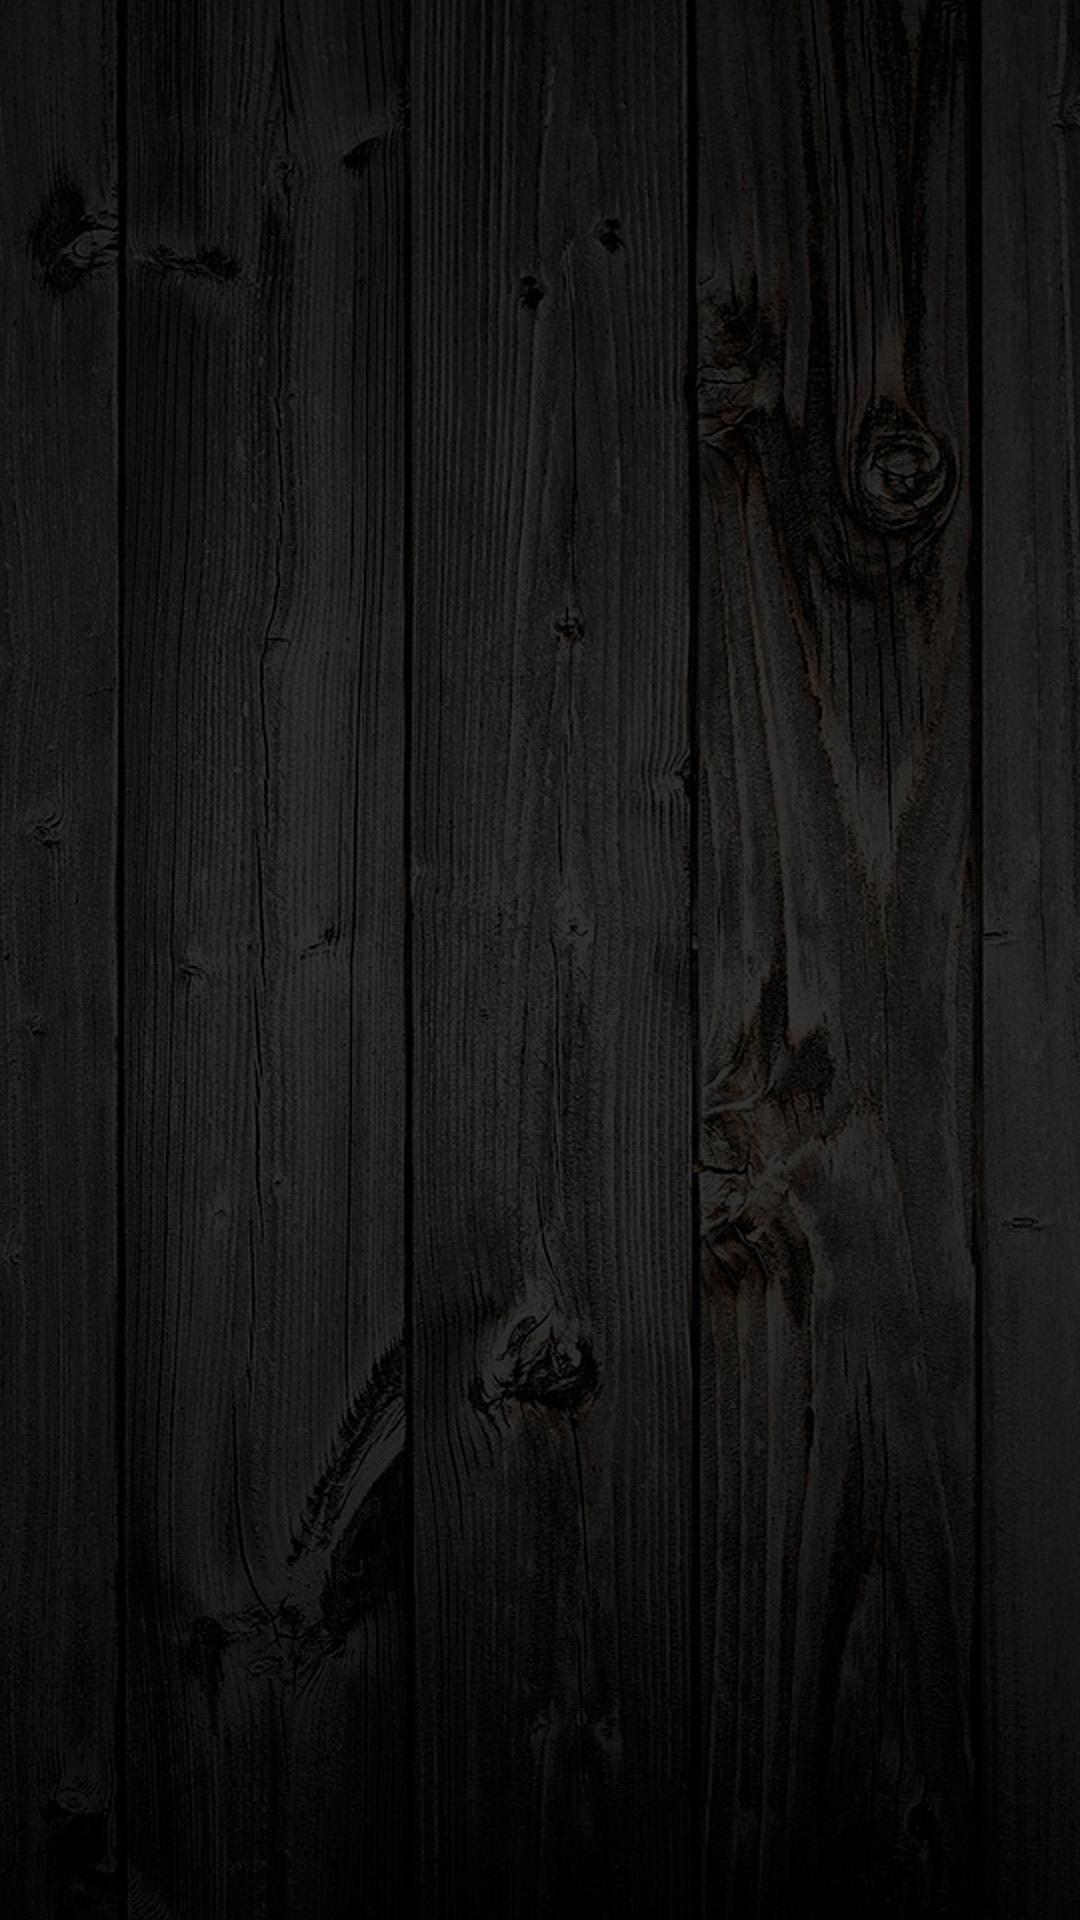 Dark Phone Wallpaper HD Live 4K Wallpapers